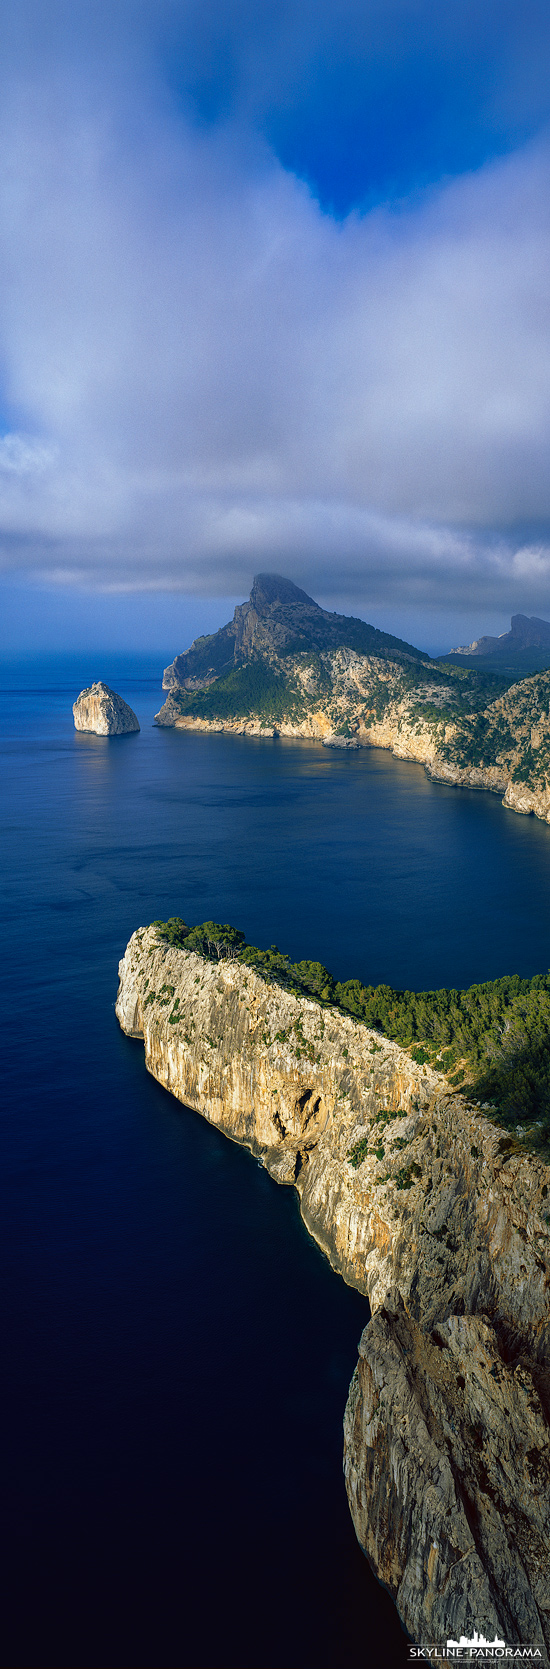 Ausflugsziele Mallorca - Cap de Formentor (p_01187)